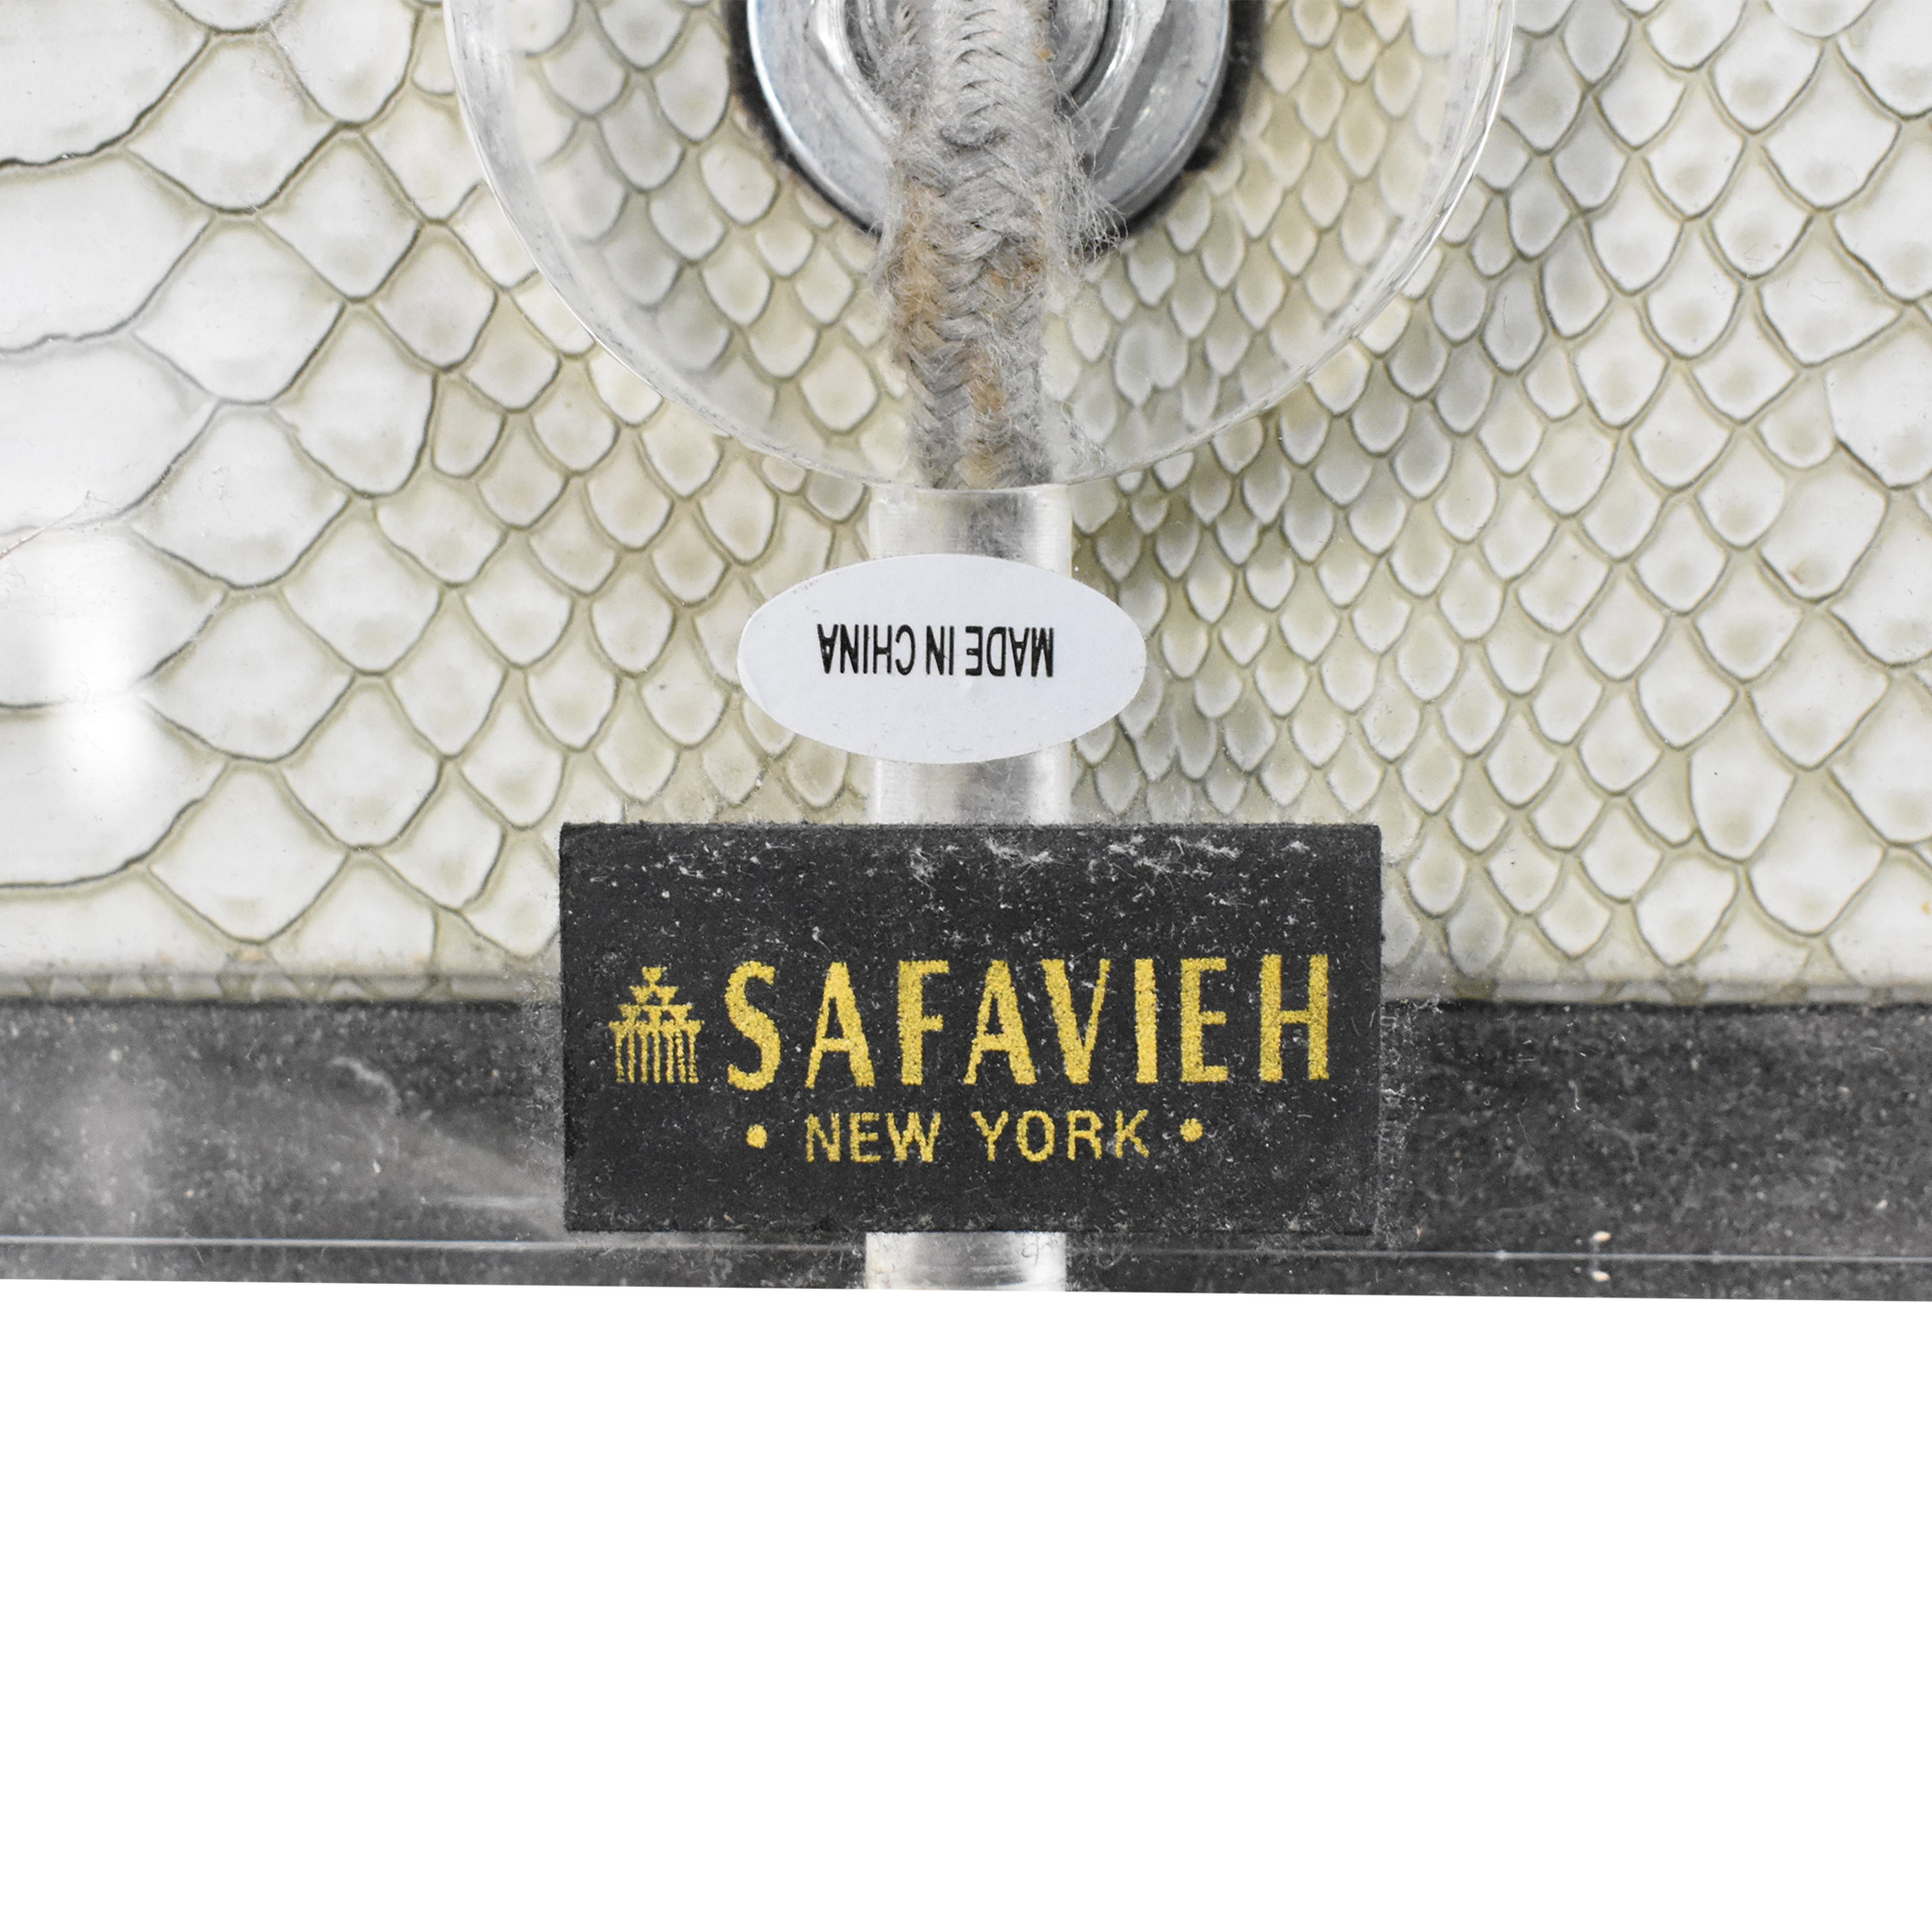 Safavieh Safavieh Delia Table Lamps used